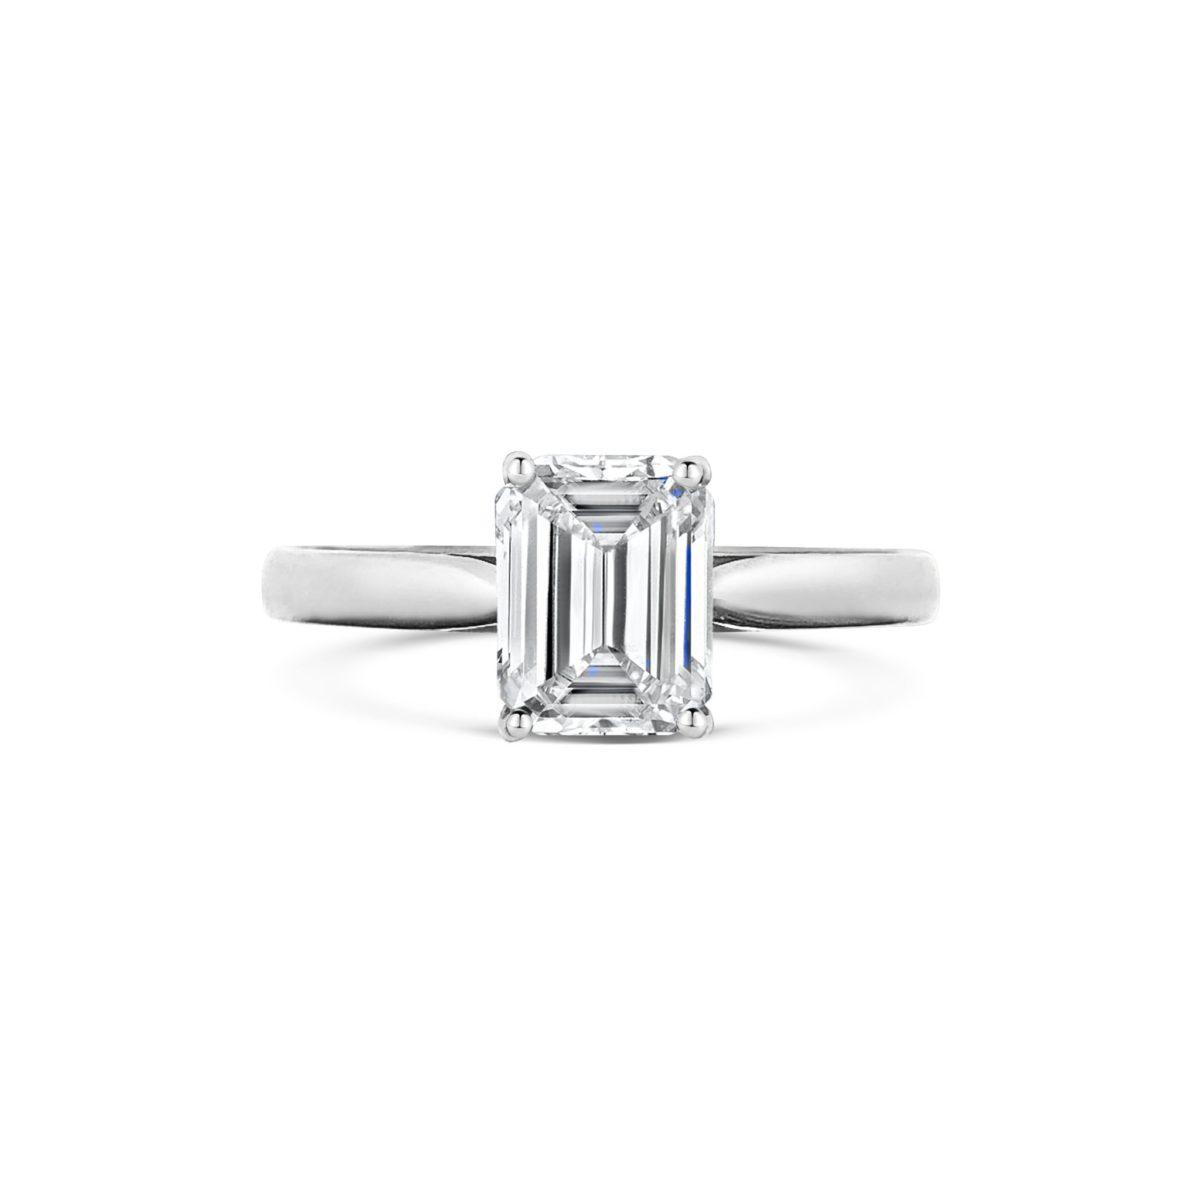 Belle Emerald Cut Diamond Solitaire Engagement Ring